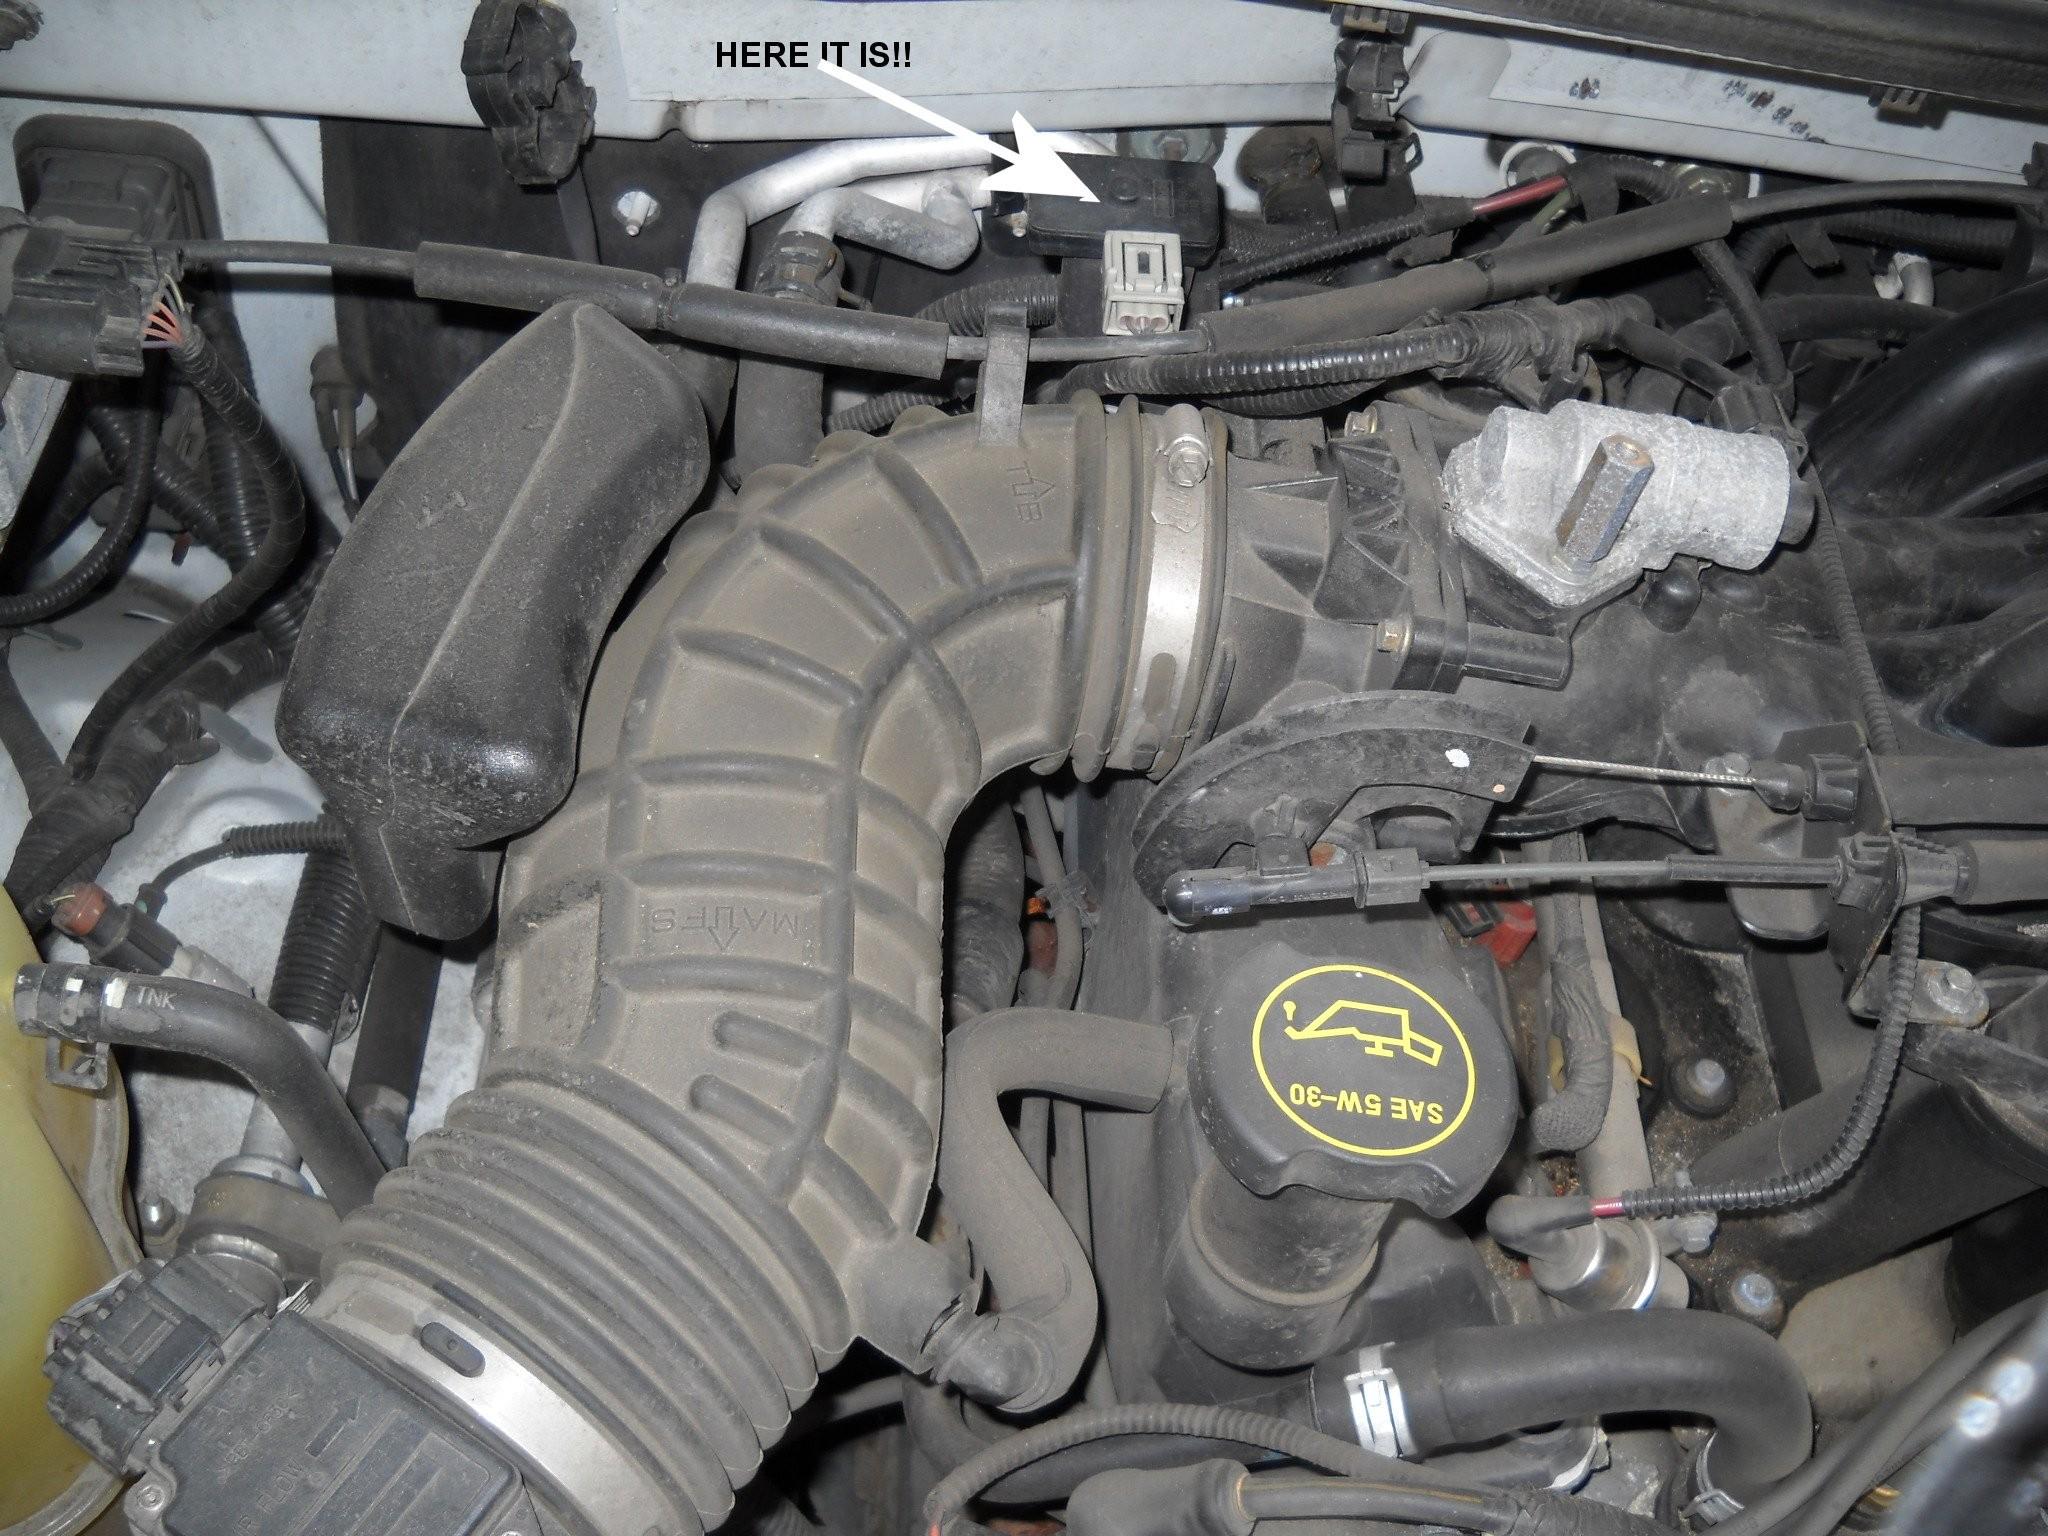 1999 ford Explorer 4 0 sohc Engine Diagram 2002 ford Explorer Xlt V6 4 0l Engine Check Light Flow Of 1999 ford Explorer 4 0 sohc Engine Diagram